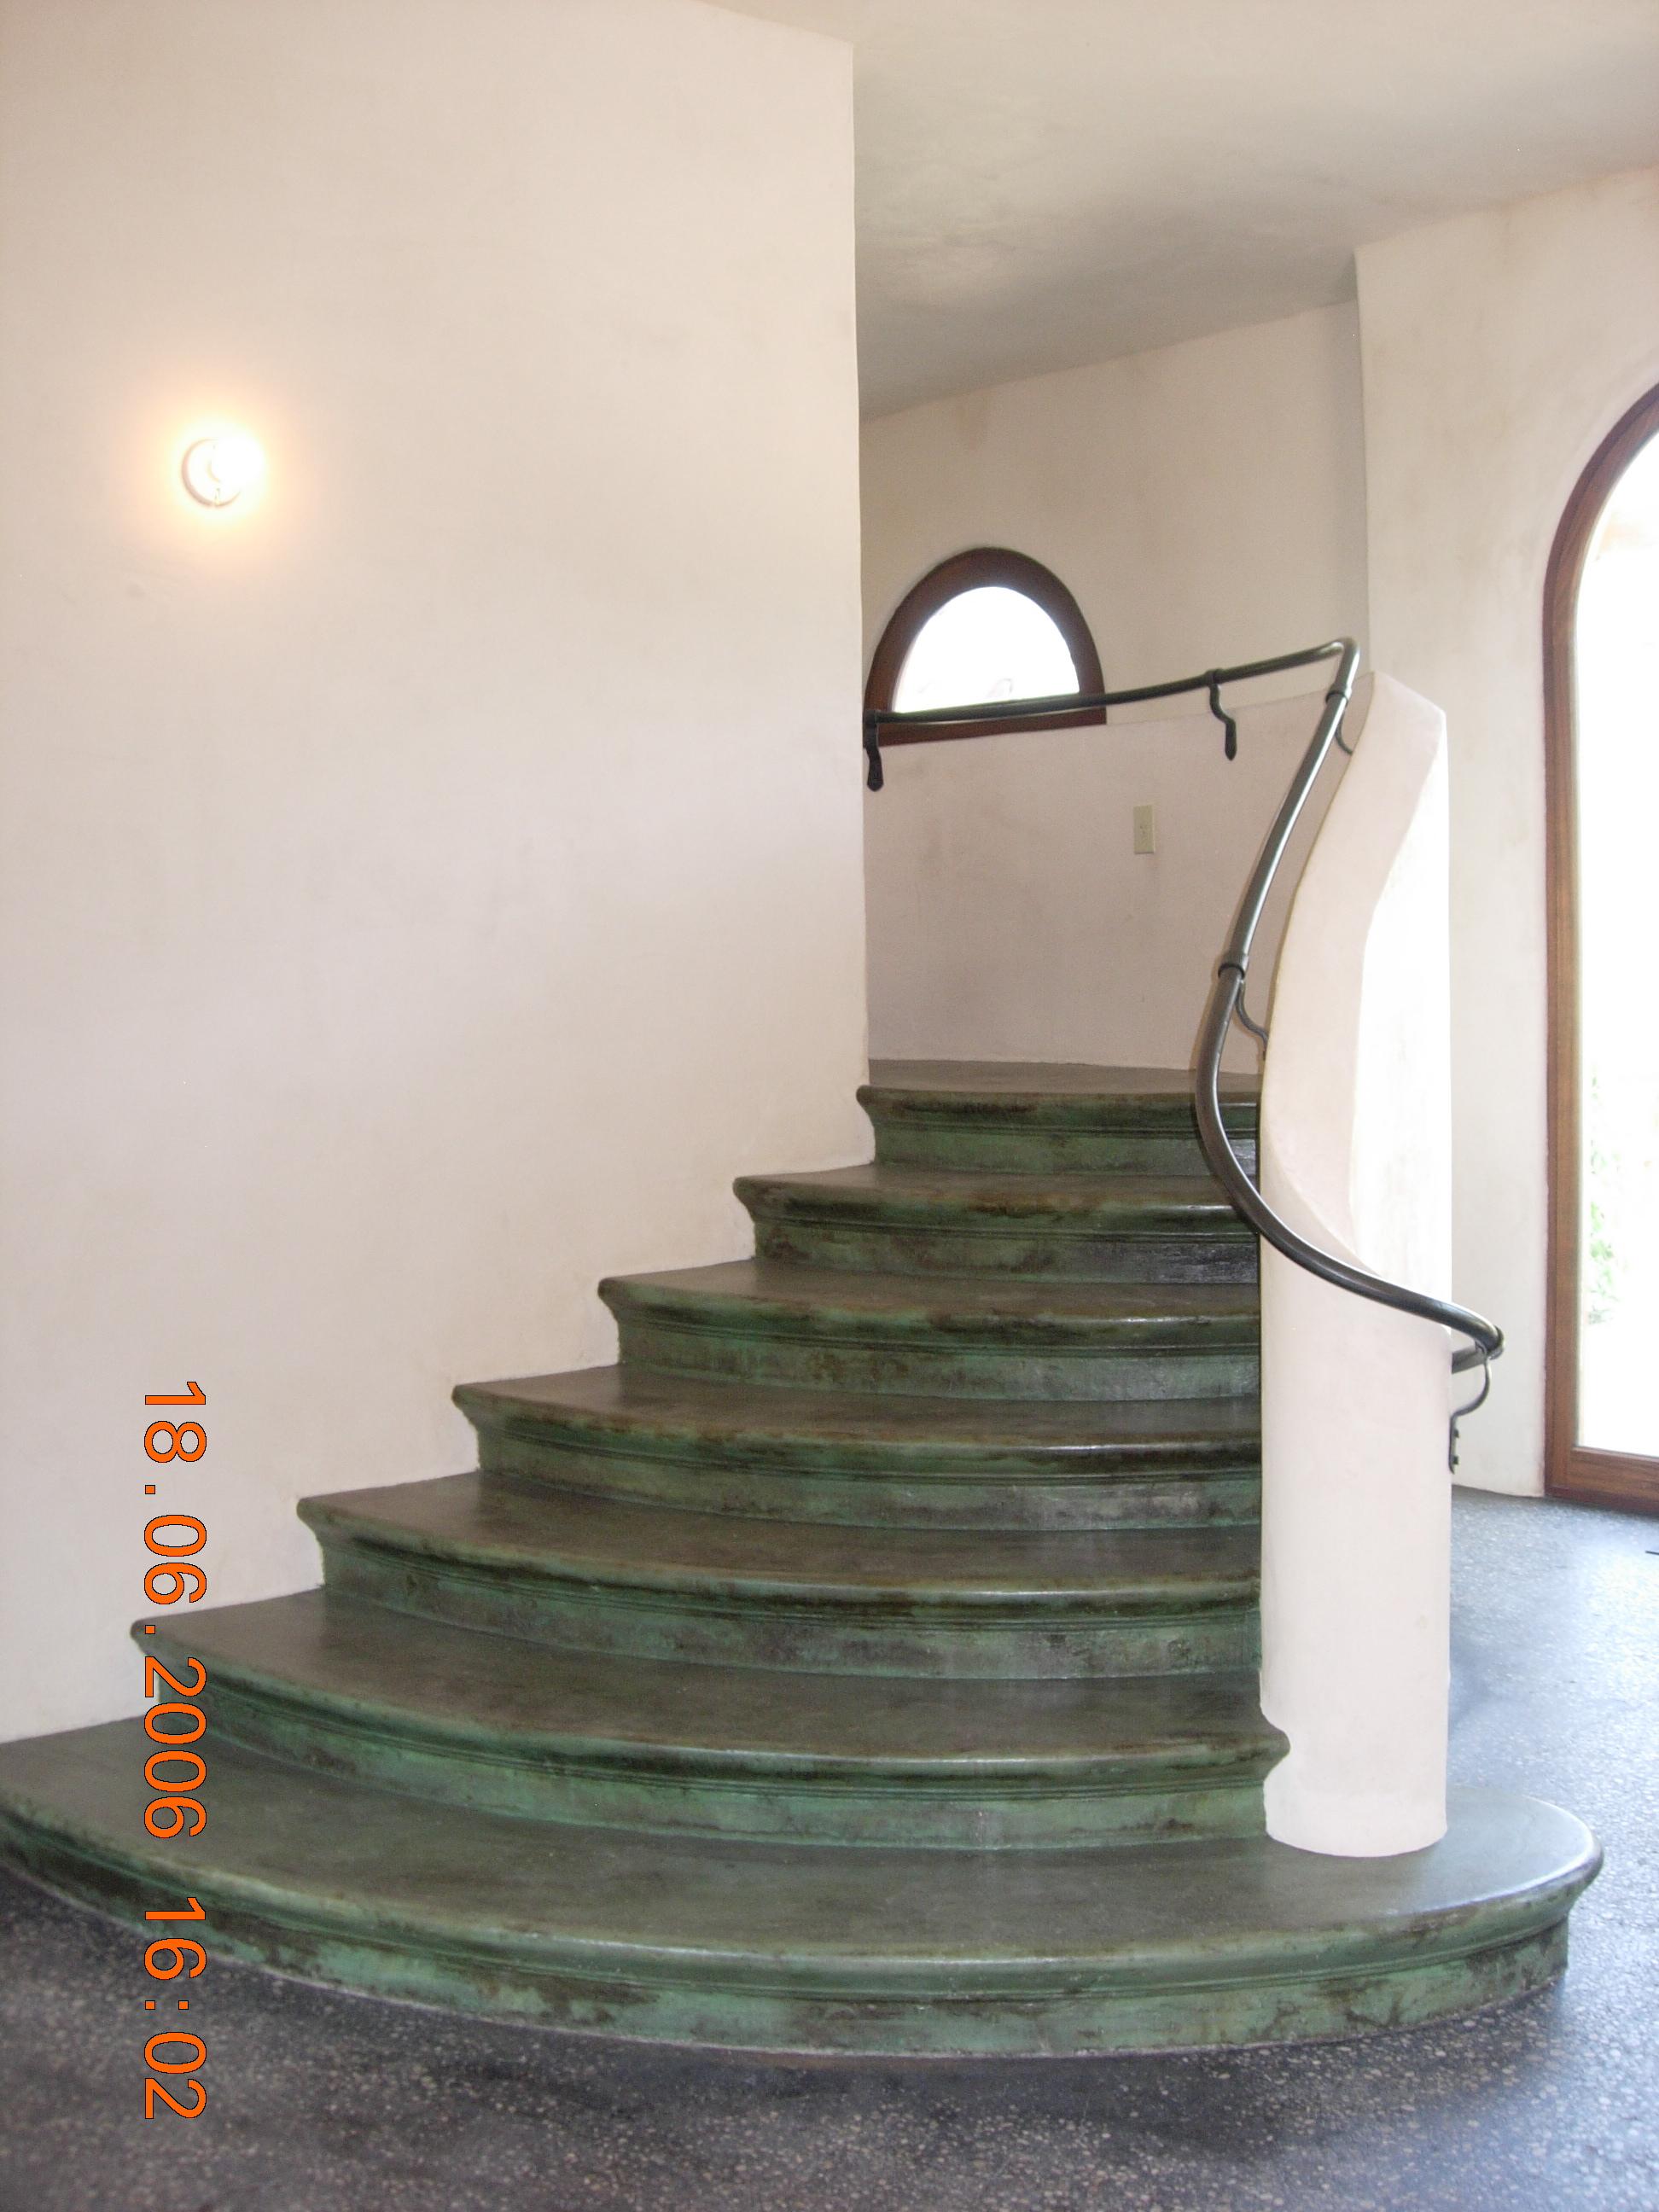 Dragon-Stone - 13. main stair copy.jpg